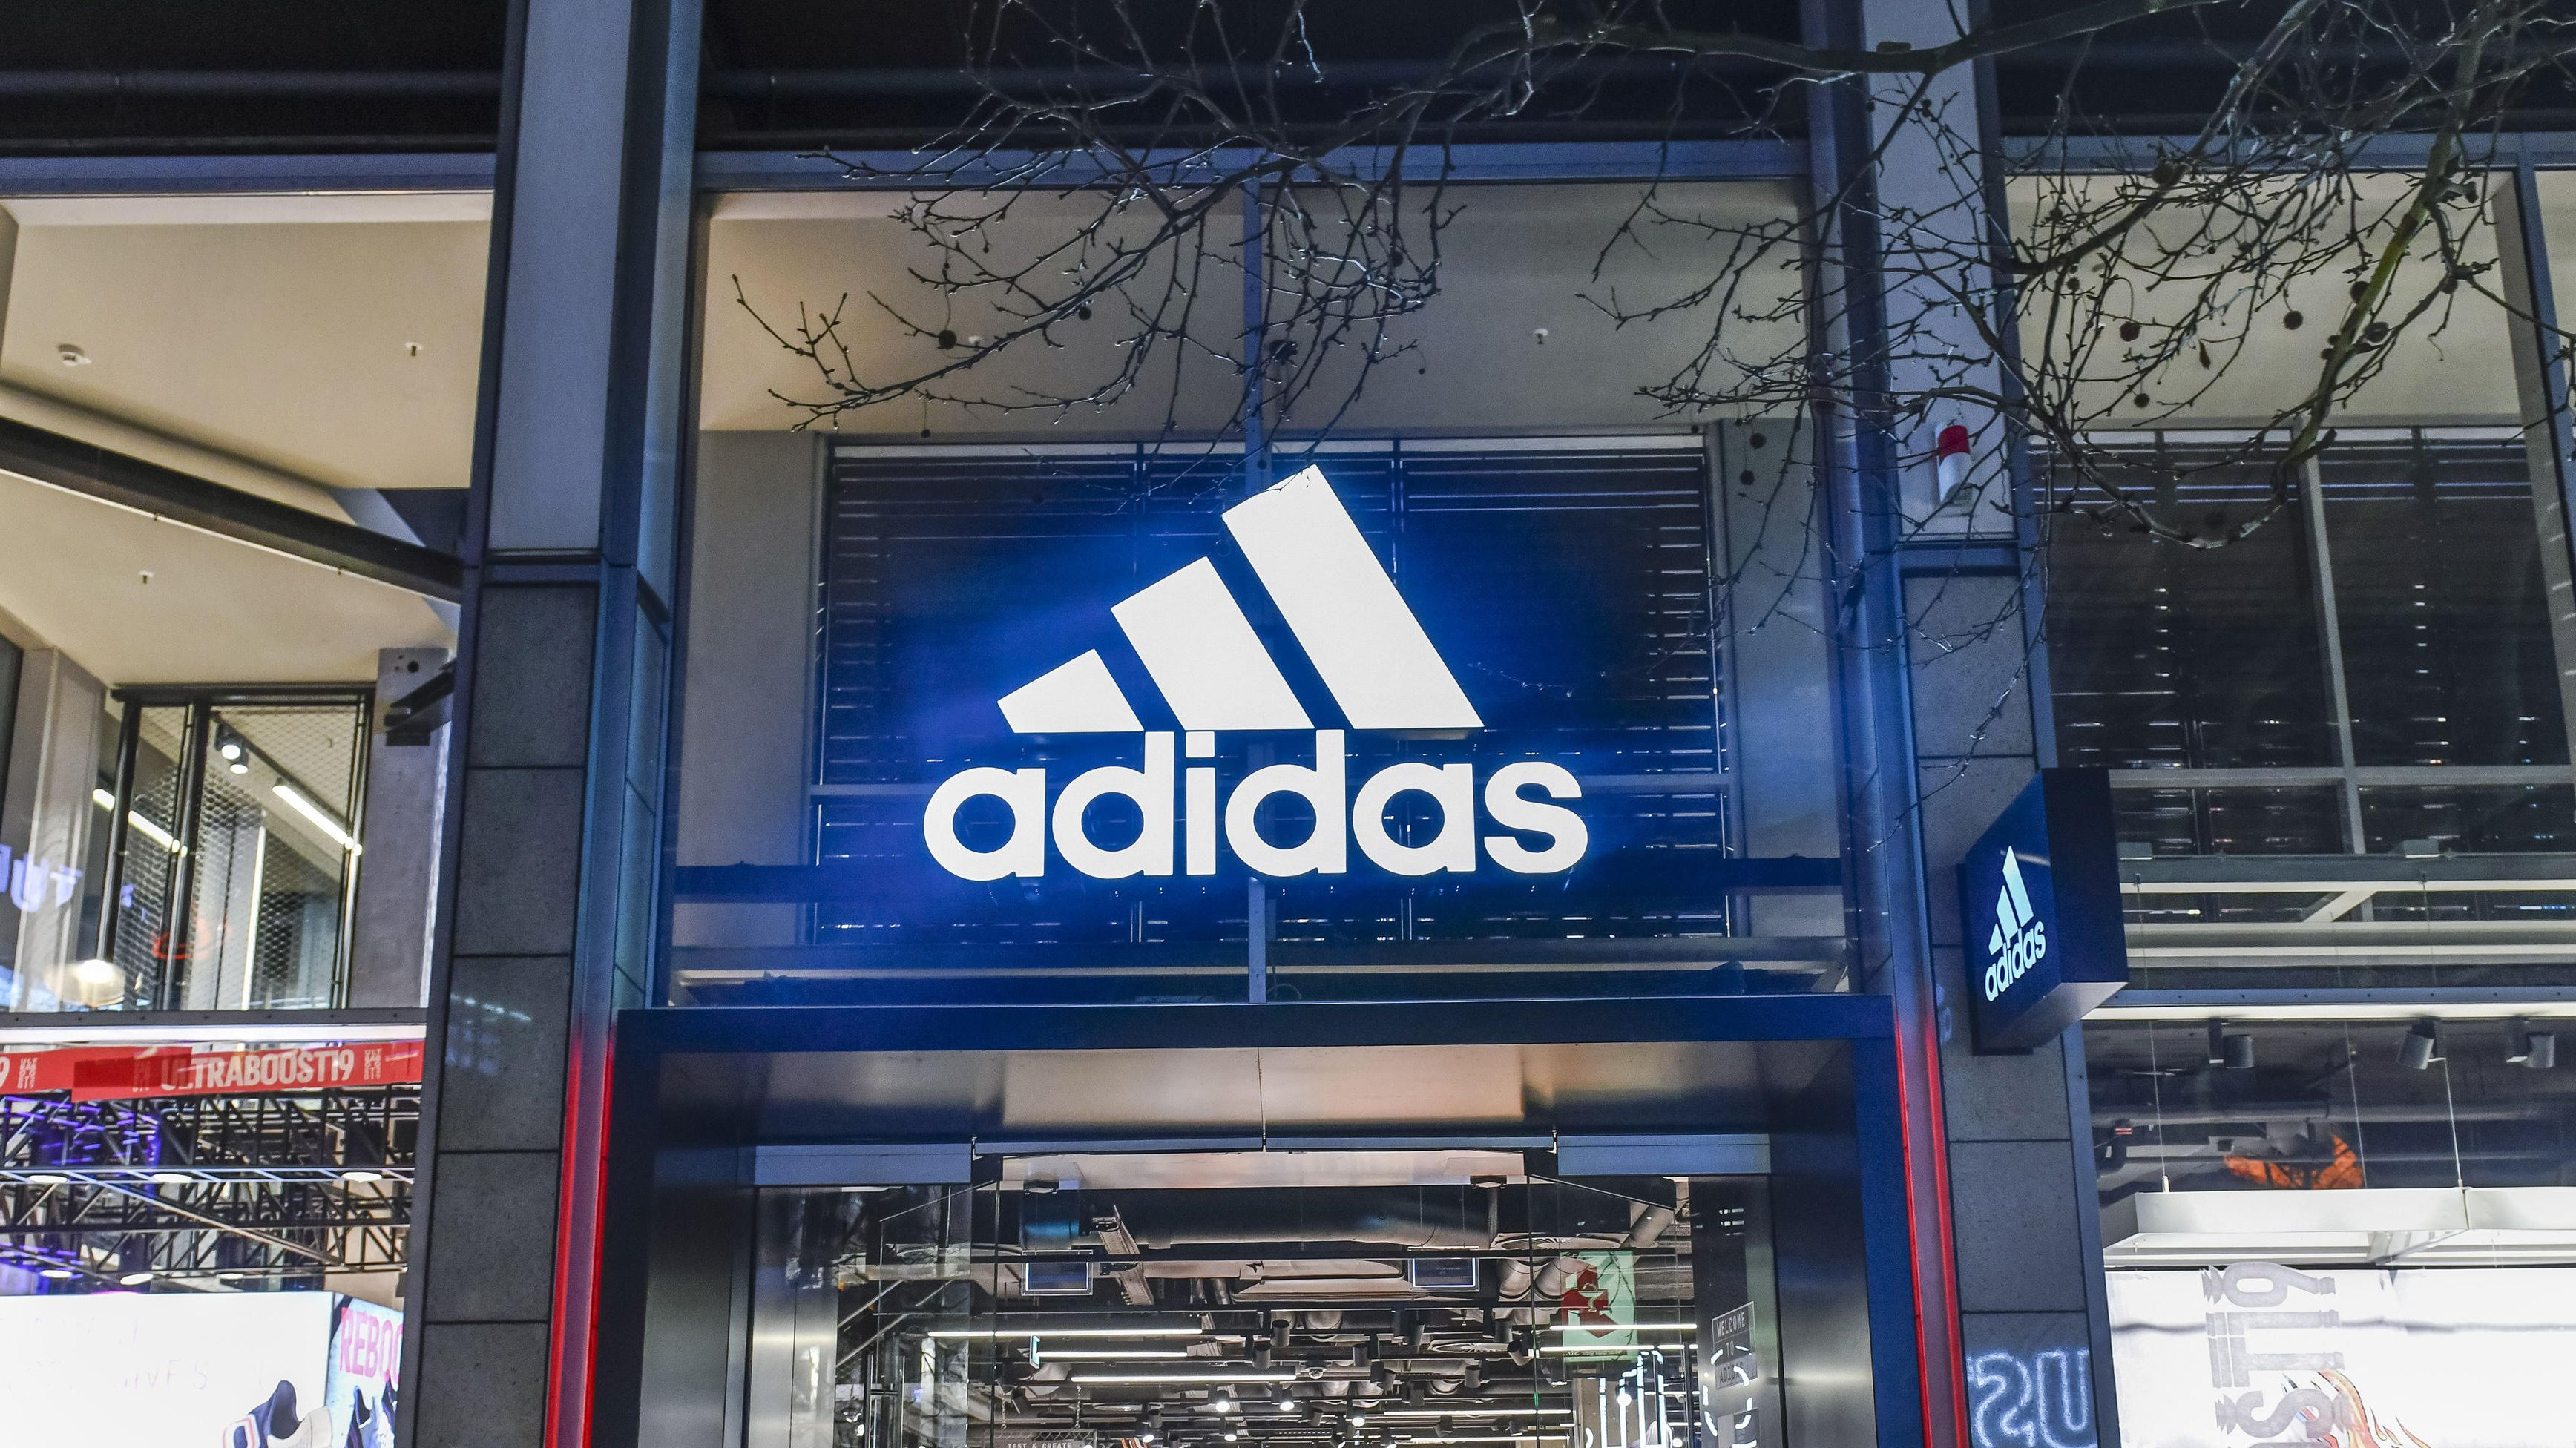 Eingang vom adidas-shop in Berlin